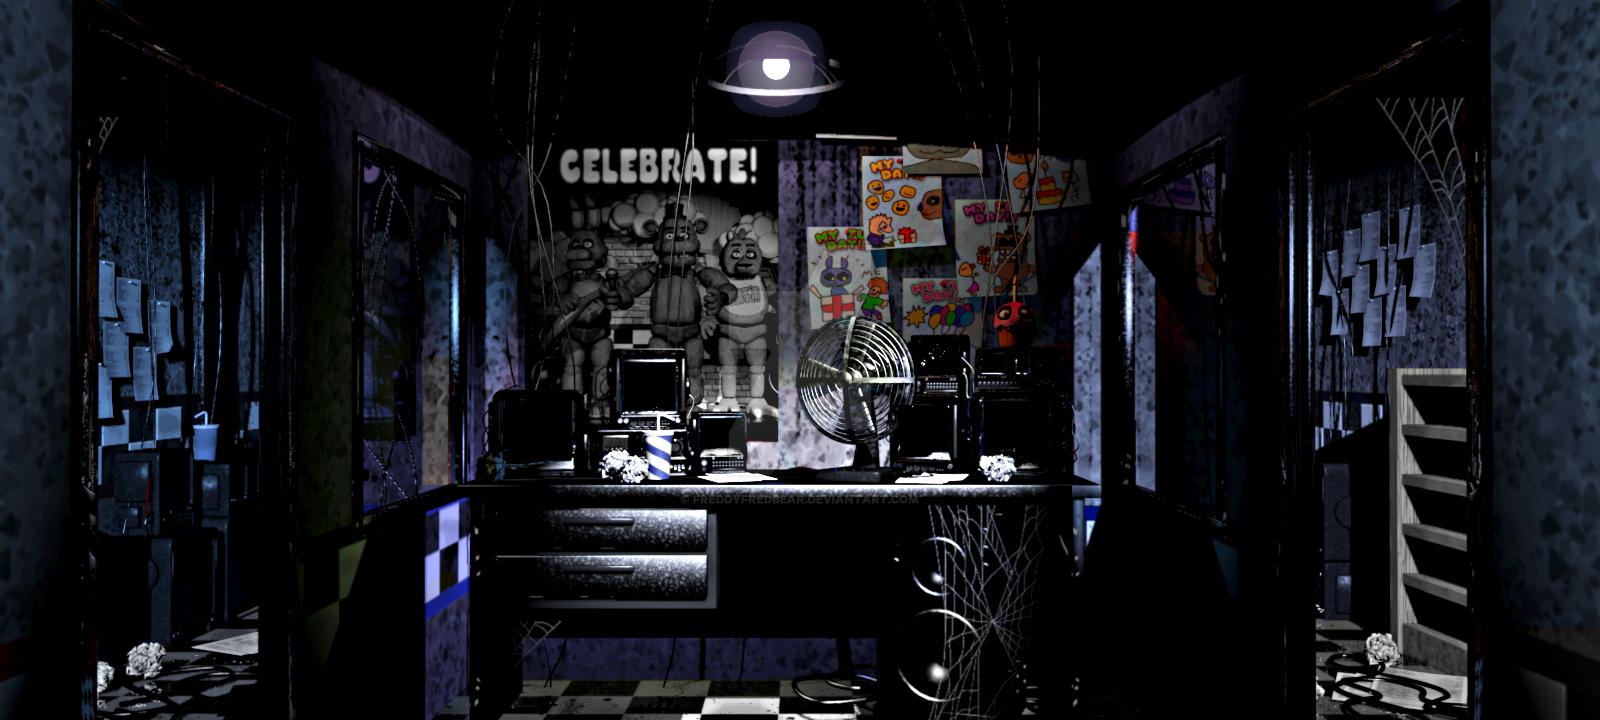 Custom Office by FreddyFredbear on DeviantArt